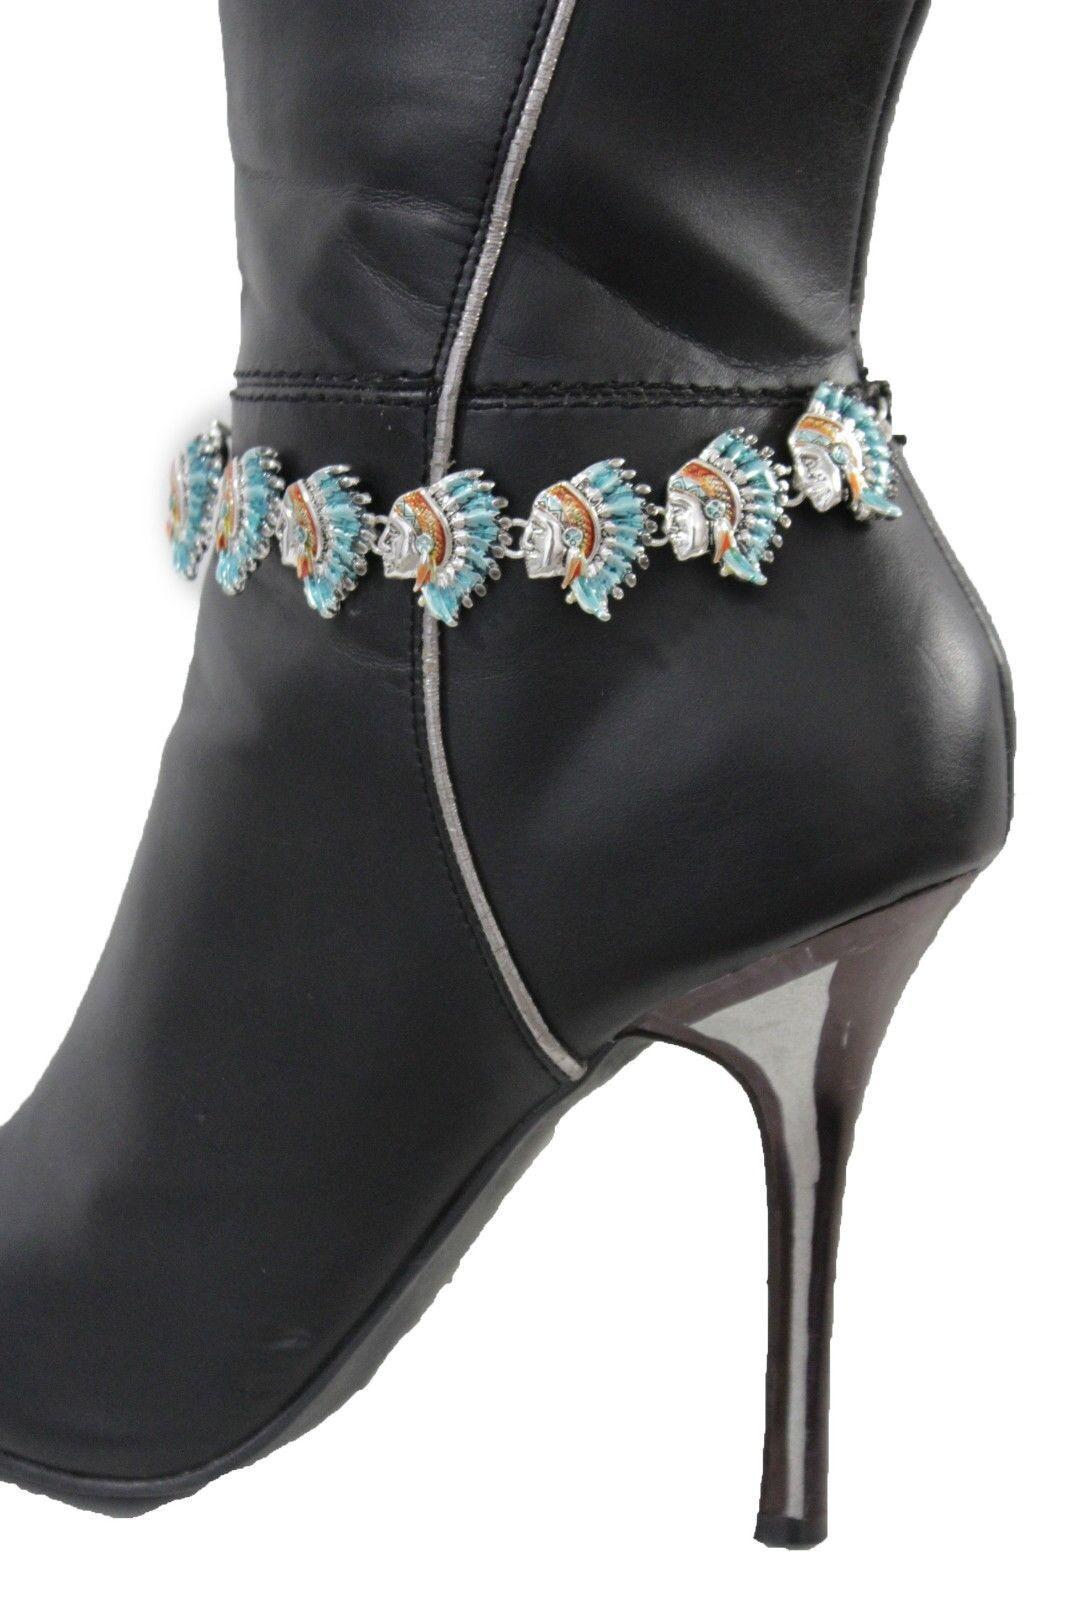 Fun Women Metal Boot Chain Anklet Bracelet Shoe Native Head Charms Bling Jewelry